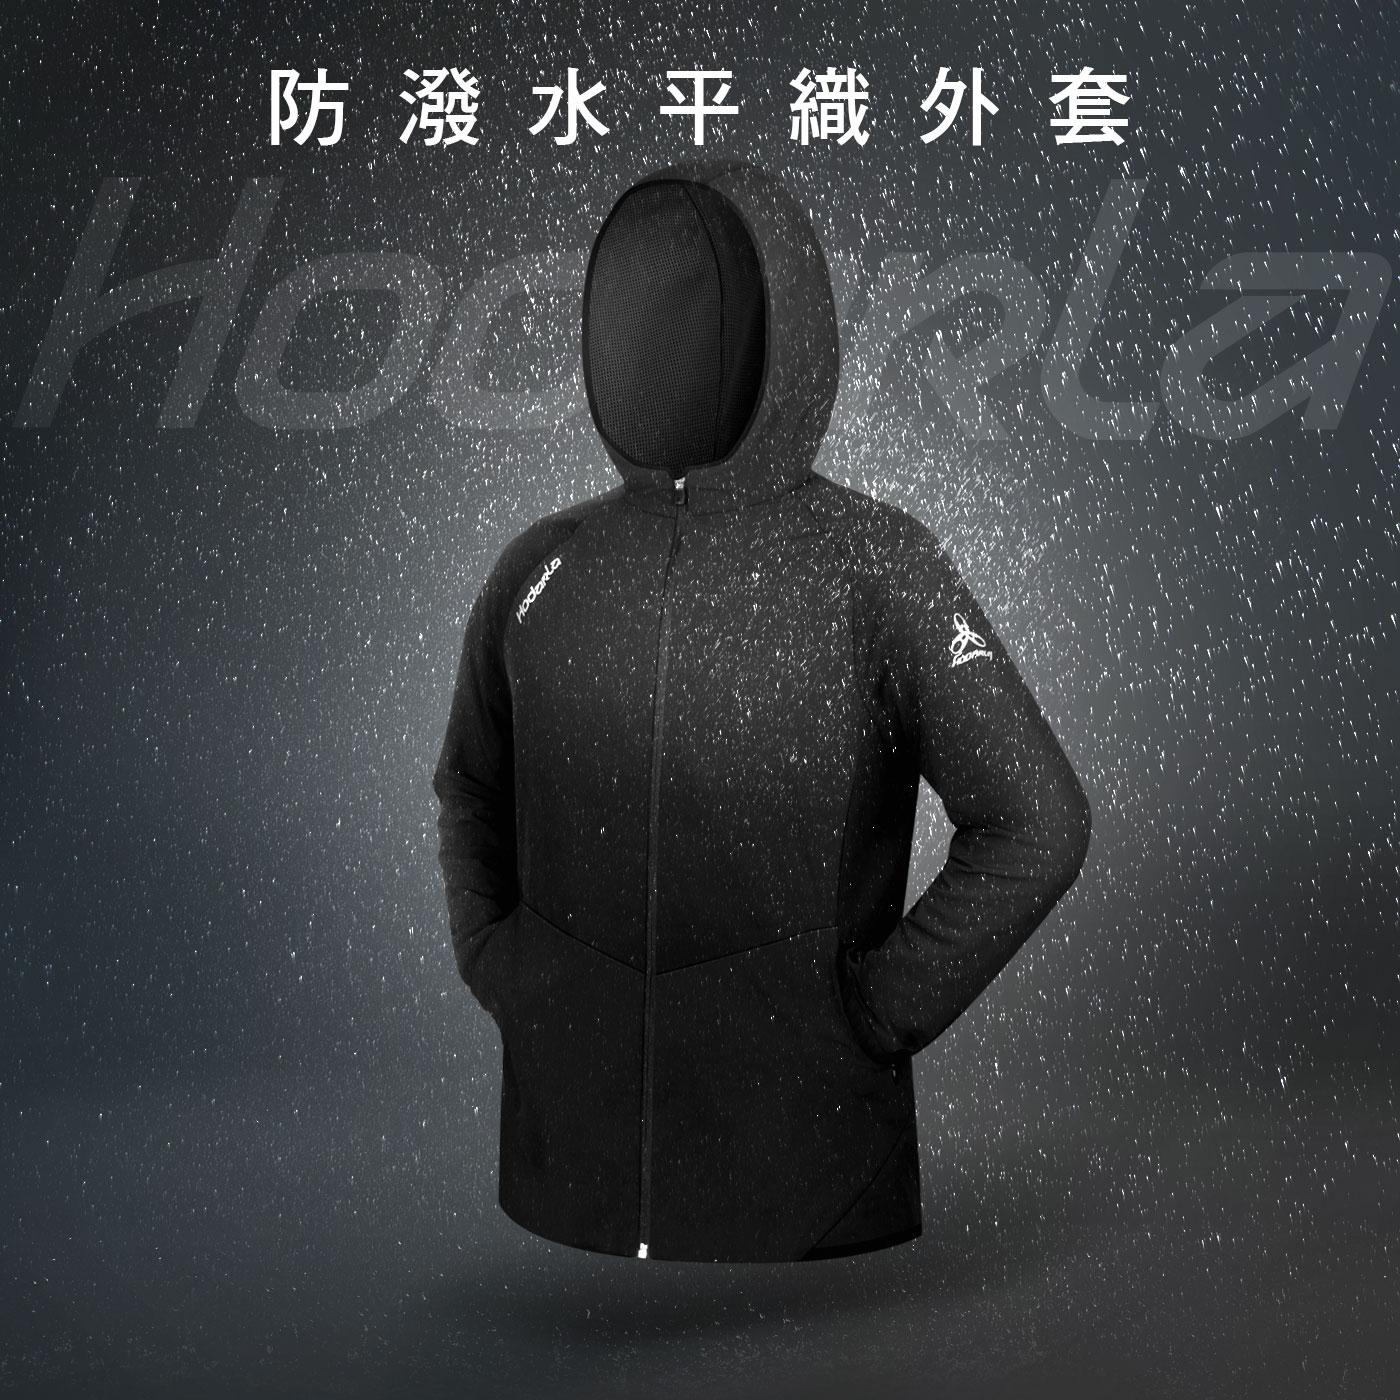 HODARLA 星豪防潑水平織外套 3157601